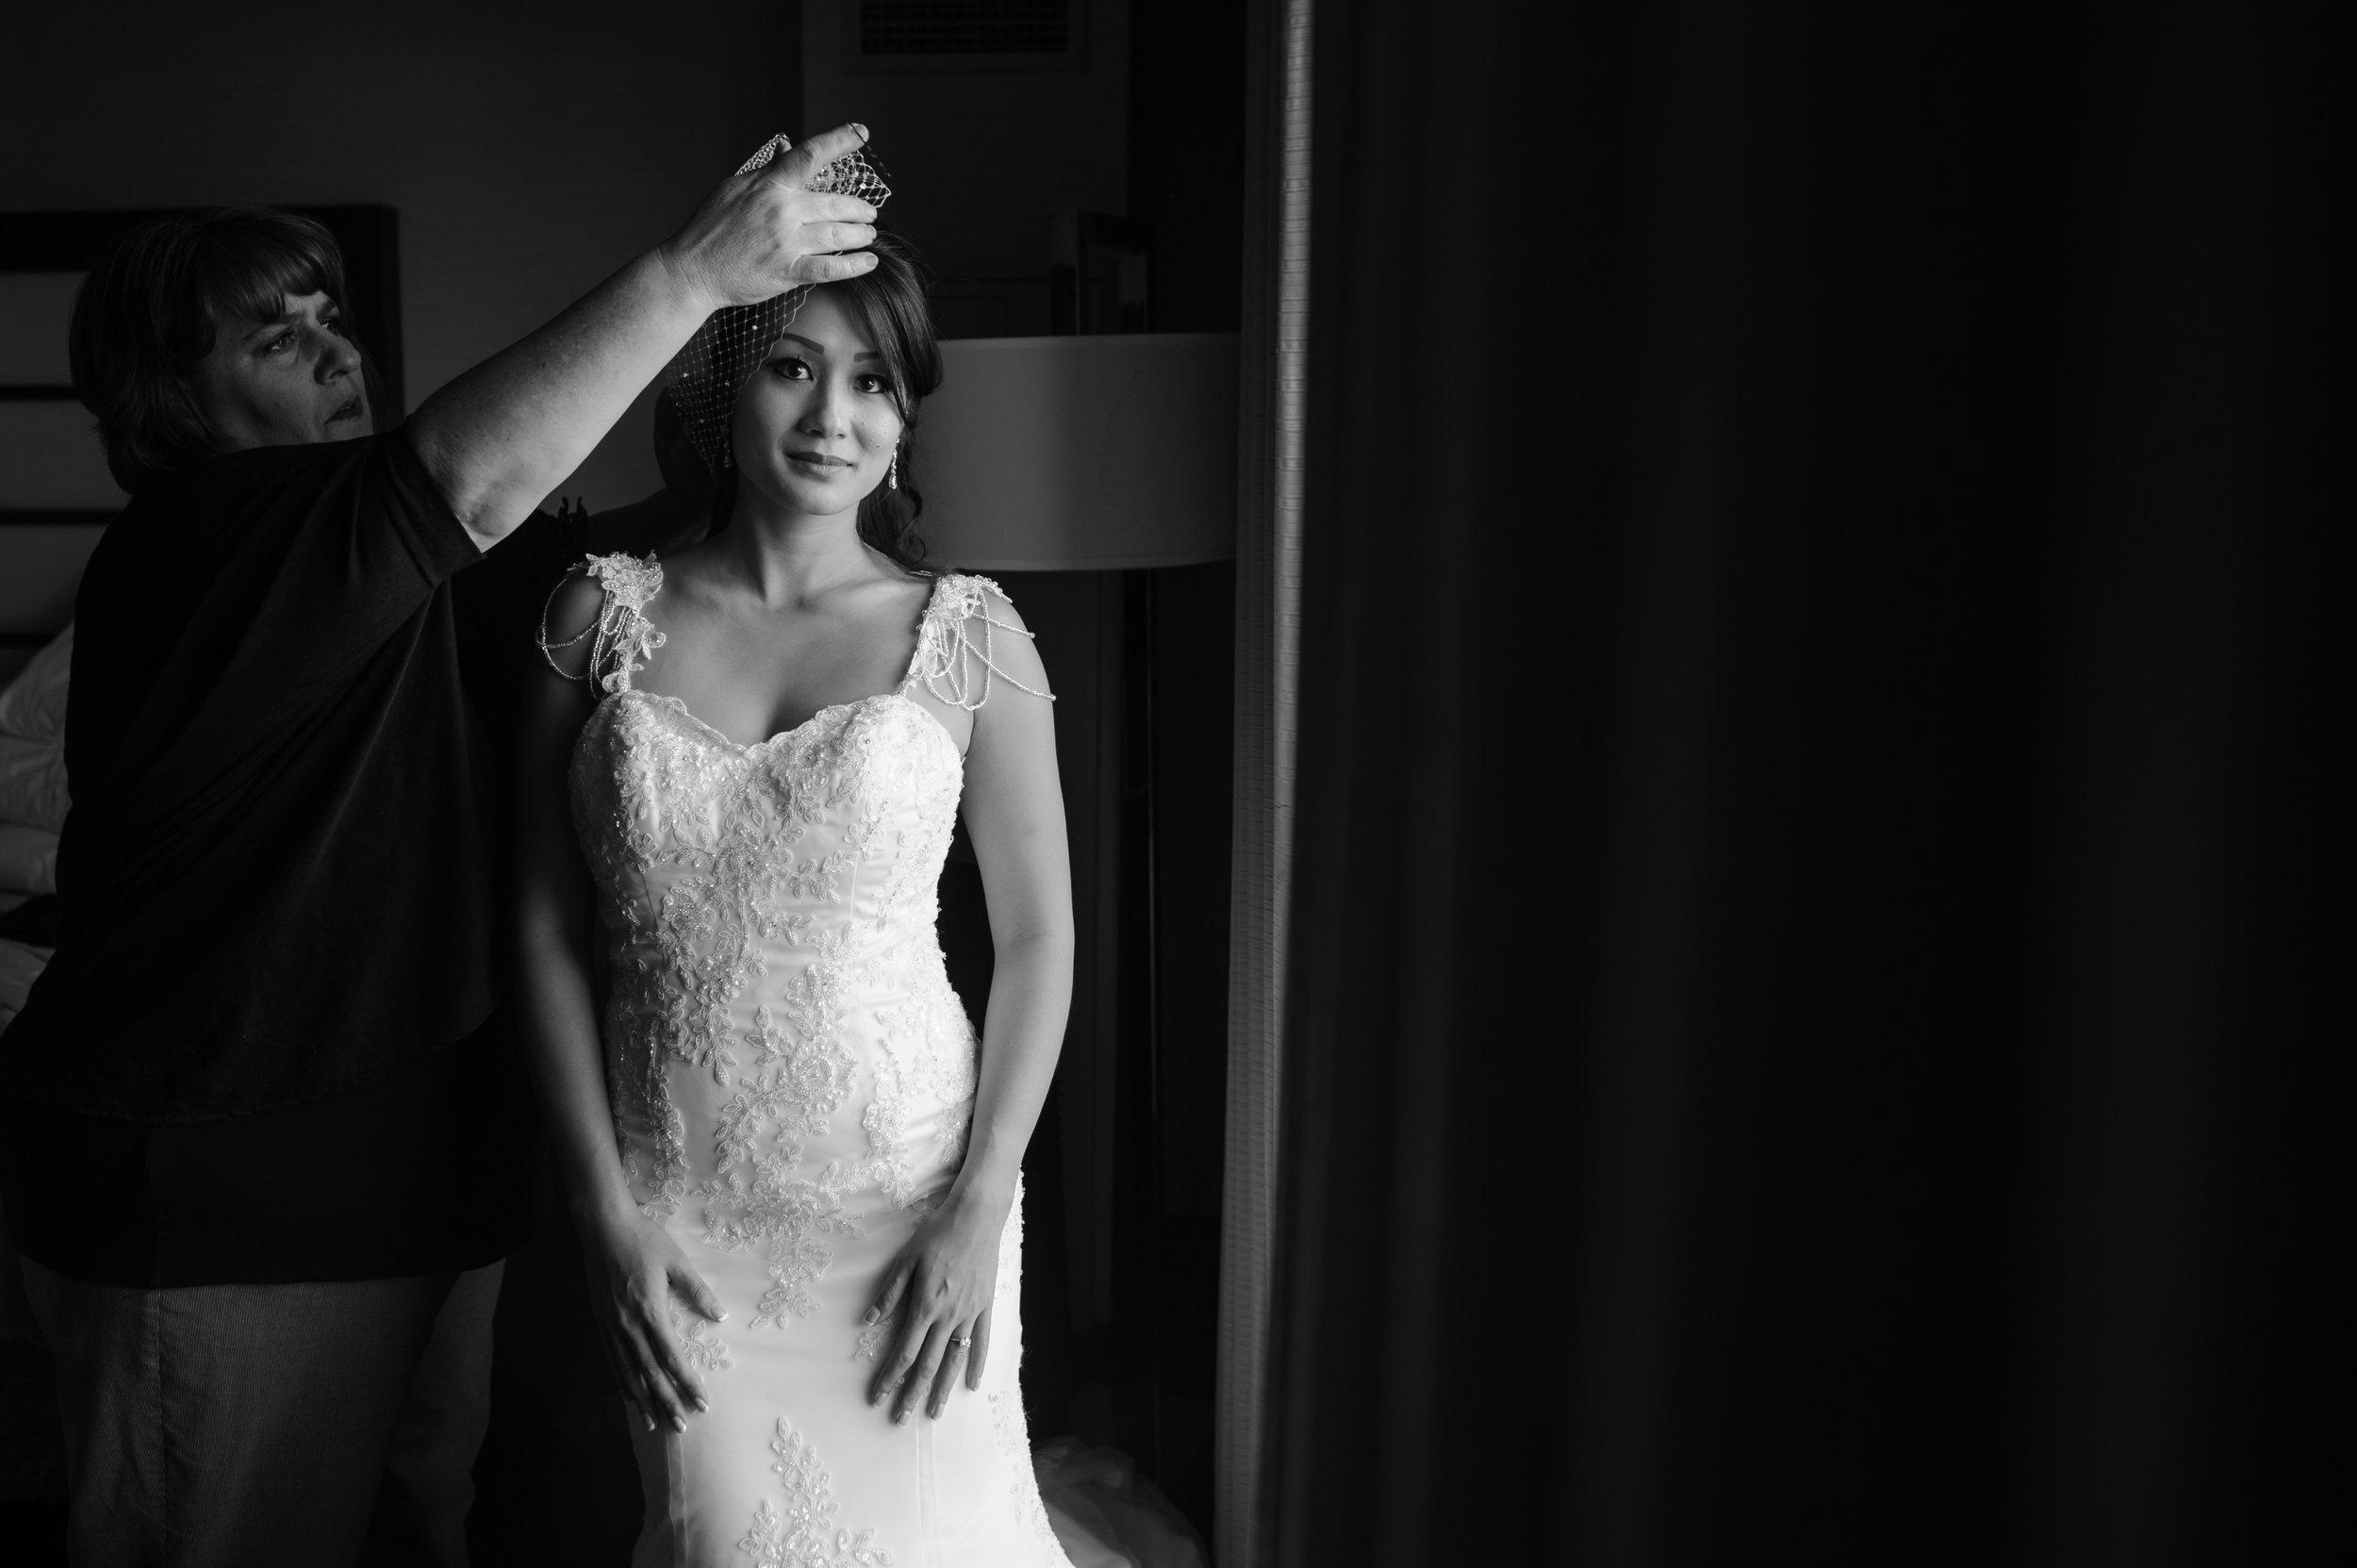 camilla-thuy-058-memorial-auditorium-sacramento-wedding-photographer-katherine-nicole-photography.JPG